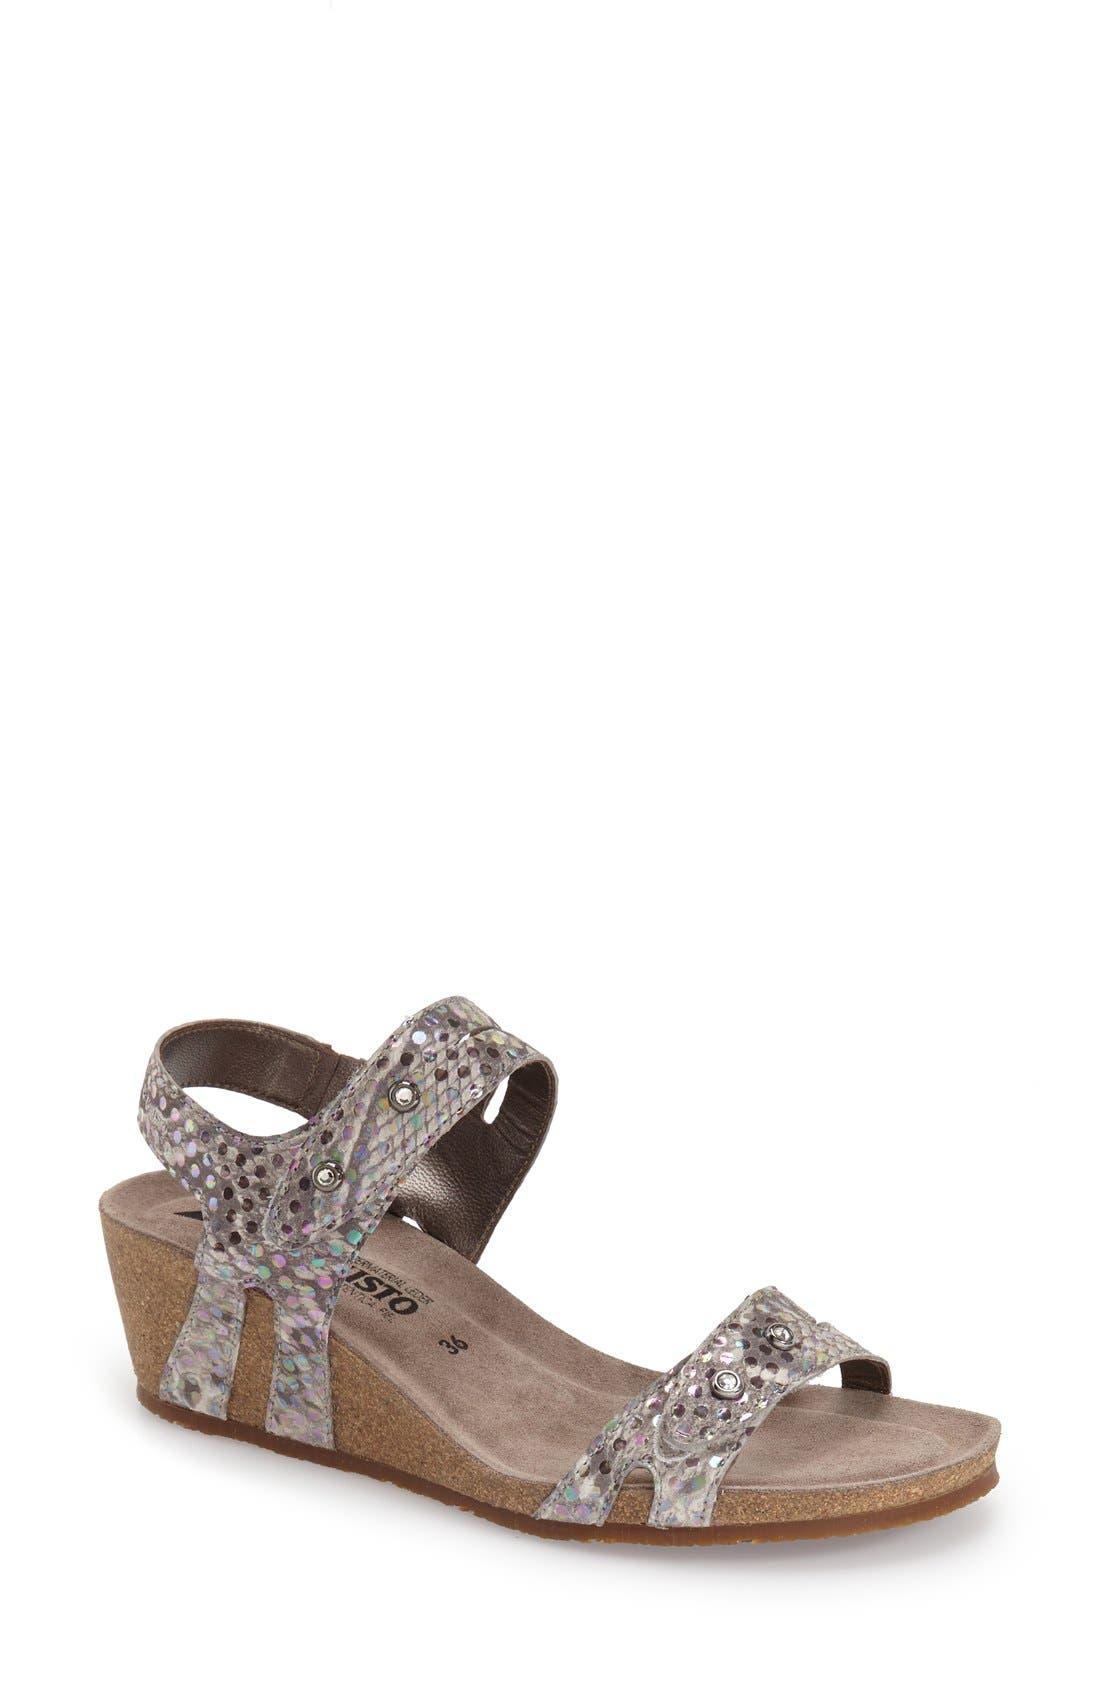 'Minoa' Wedge Sandal,                         Main,                         color, LIGHT GREY MIMOSA